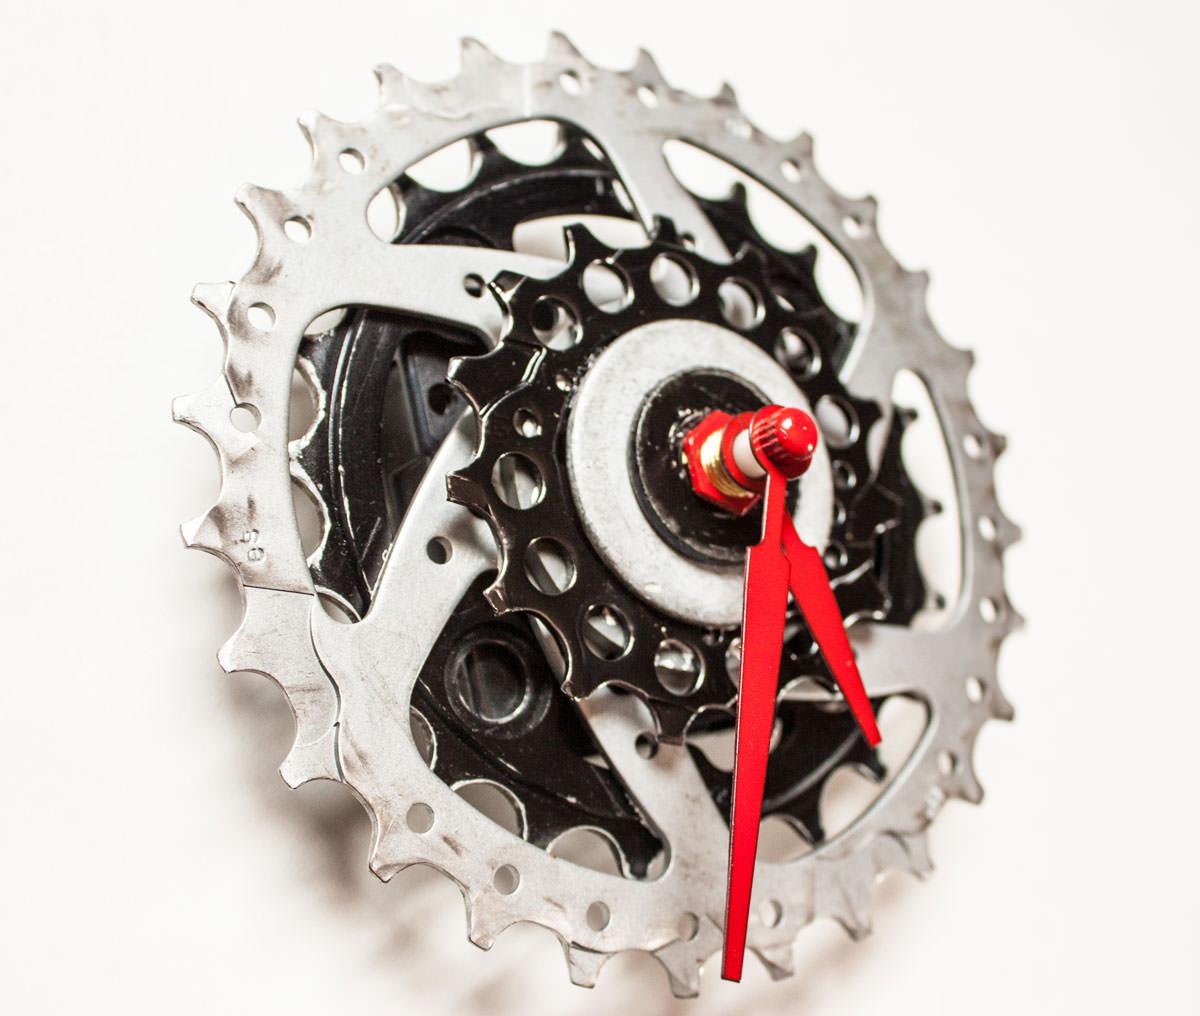 Black and Silver Bike Sprocket Clock angle